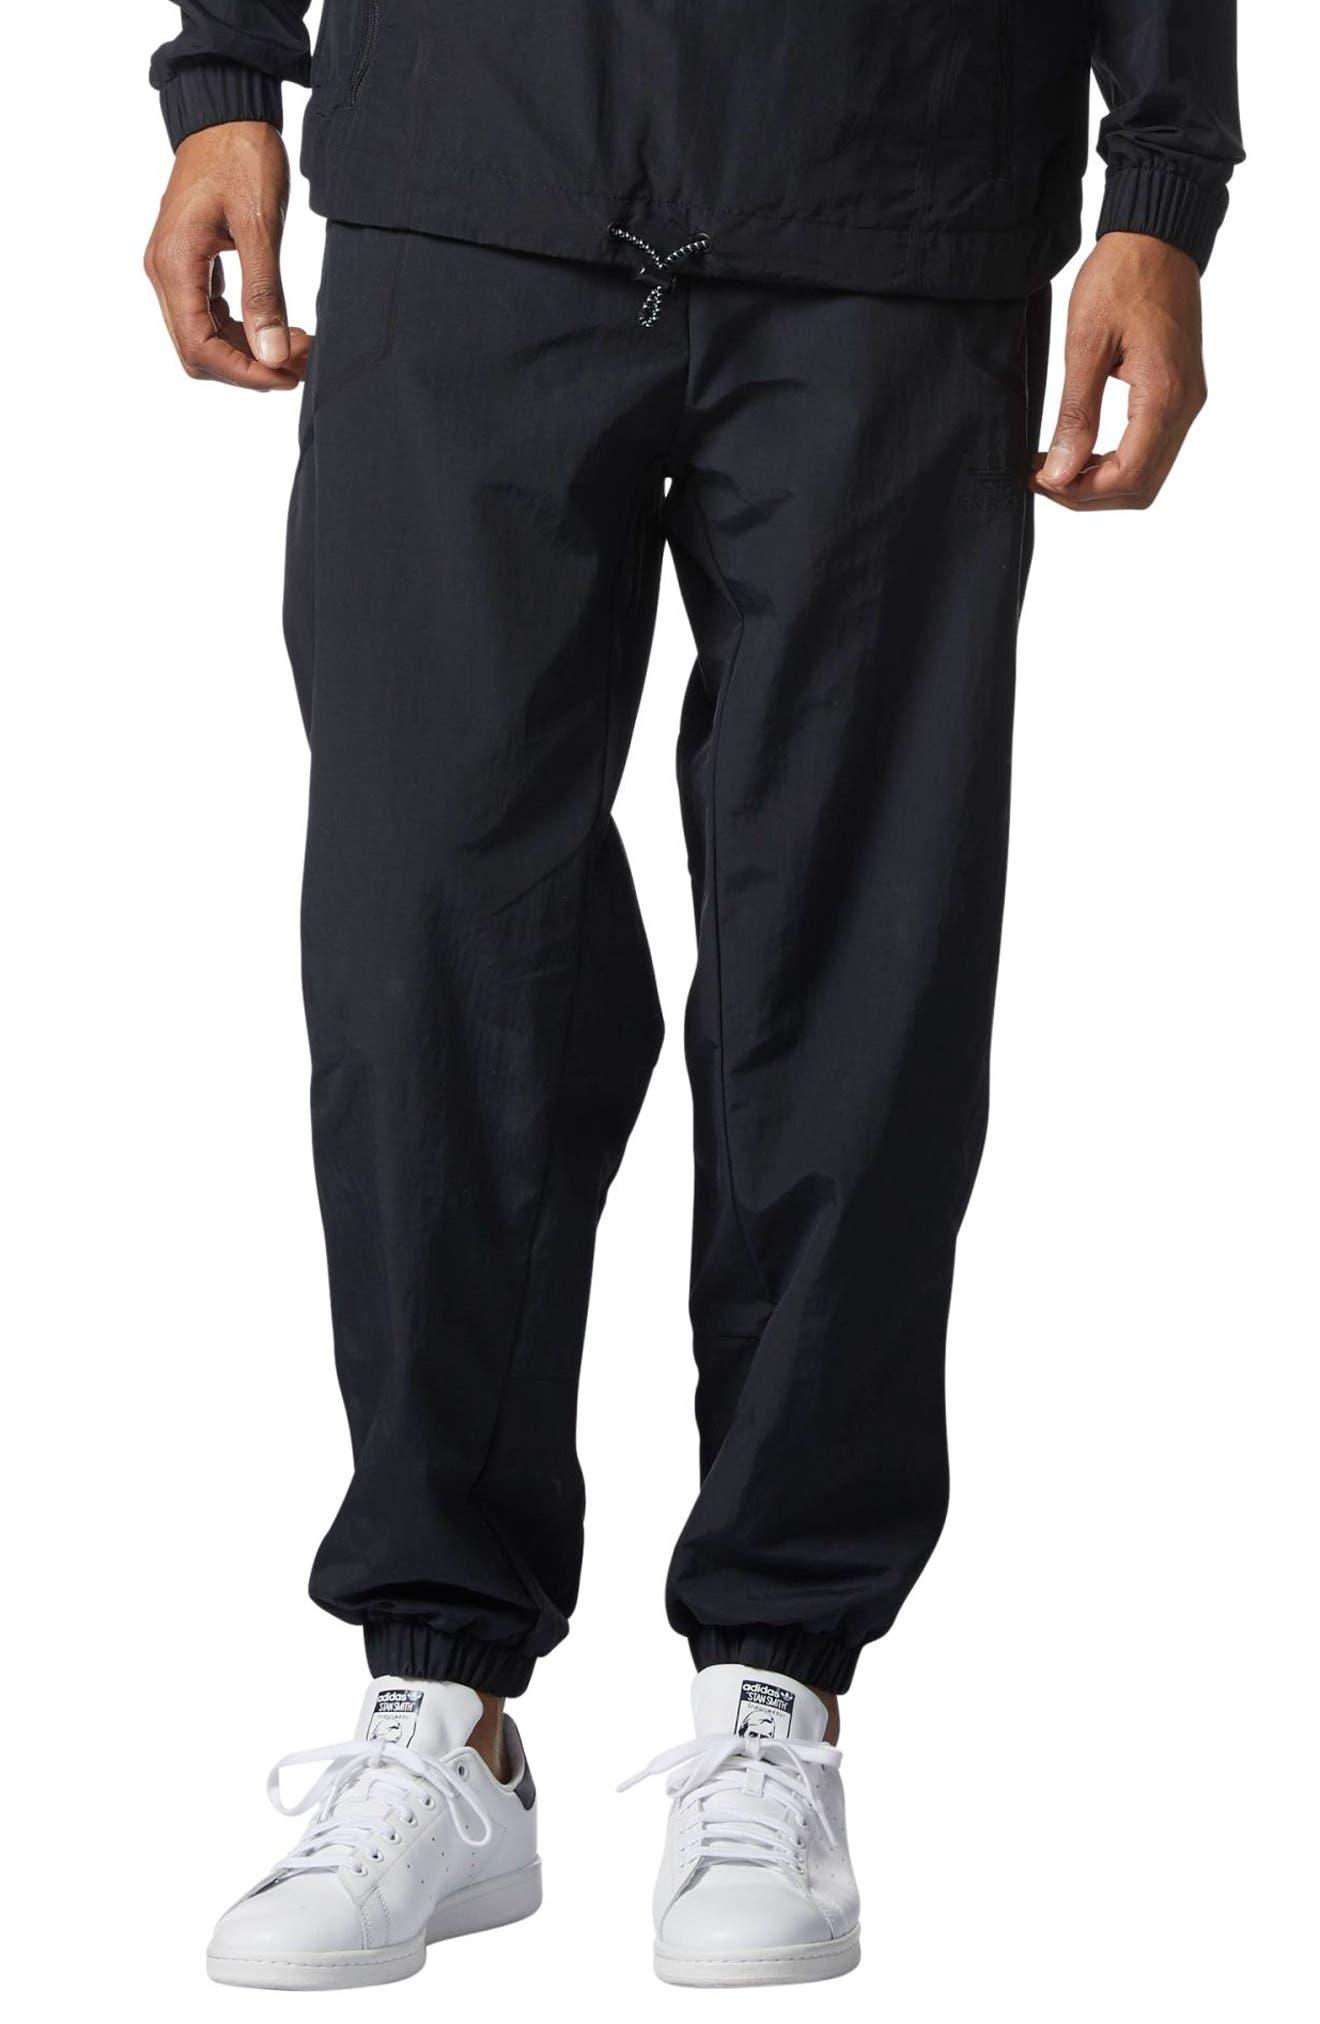 Originals Taped Wind Pants,                         Main,                         color, 001